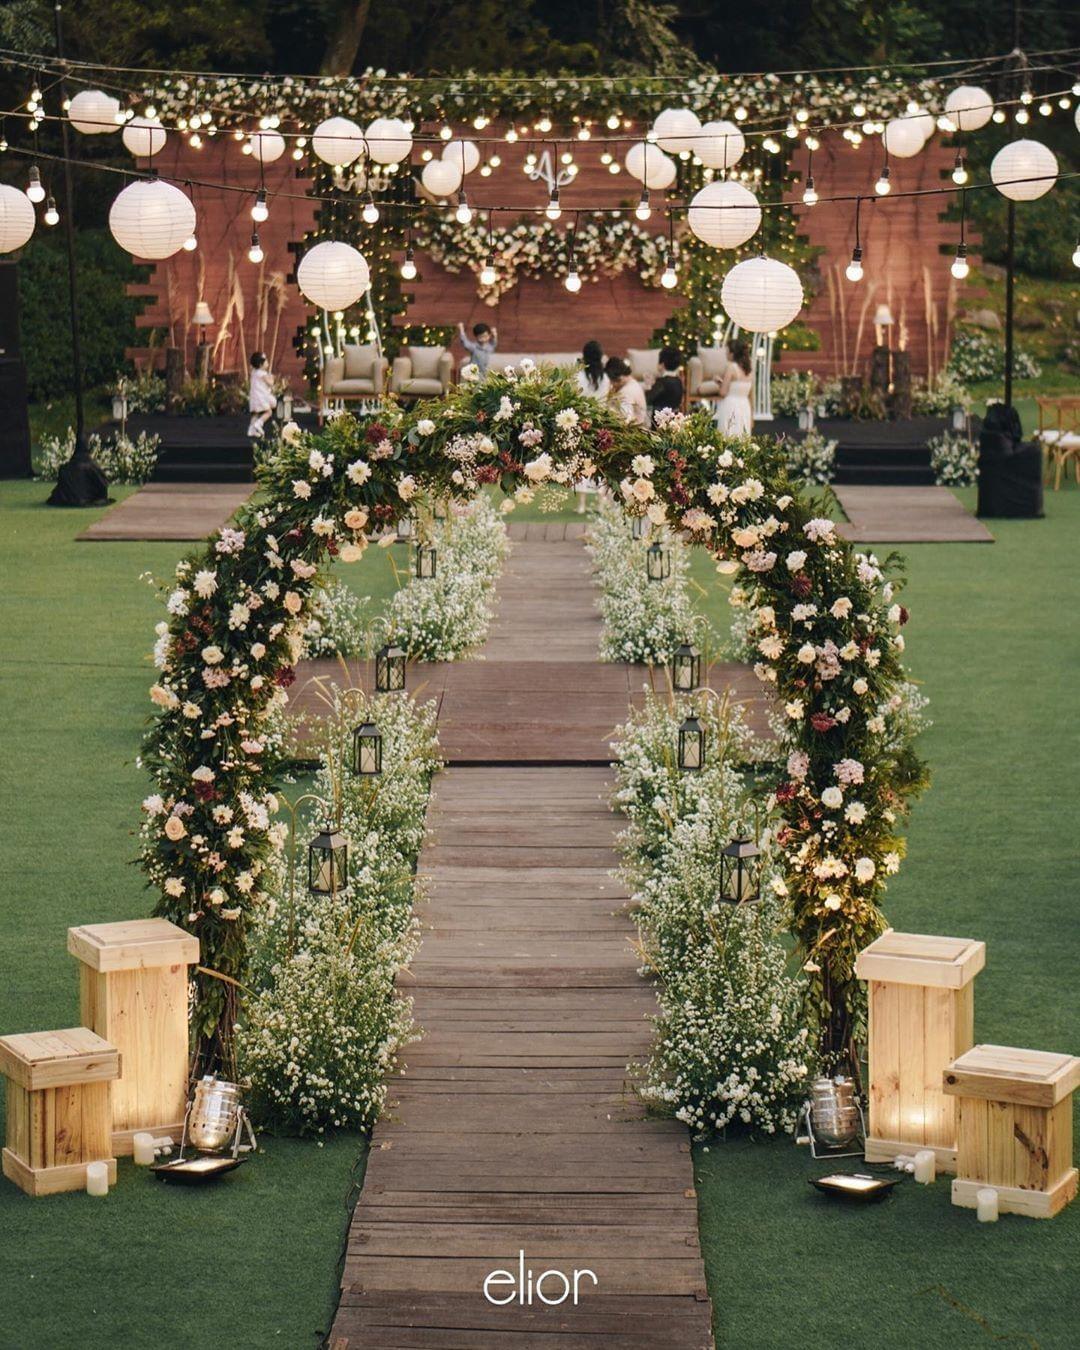 Outdoor Wedding Decoration With Lanterns Dekorasi Pernikahan Outdoor Dengan Lampion This In 2020 Outdoor Wedding Decorations Wedding Backdrop Design Outdoor Wedding